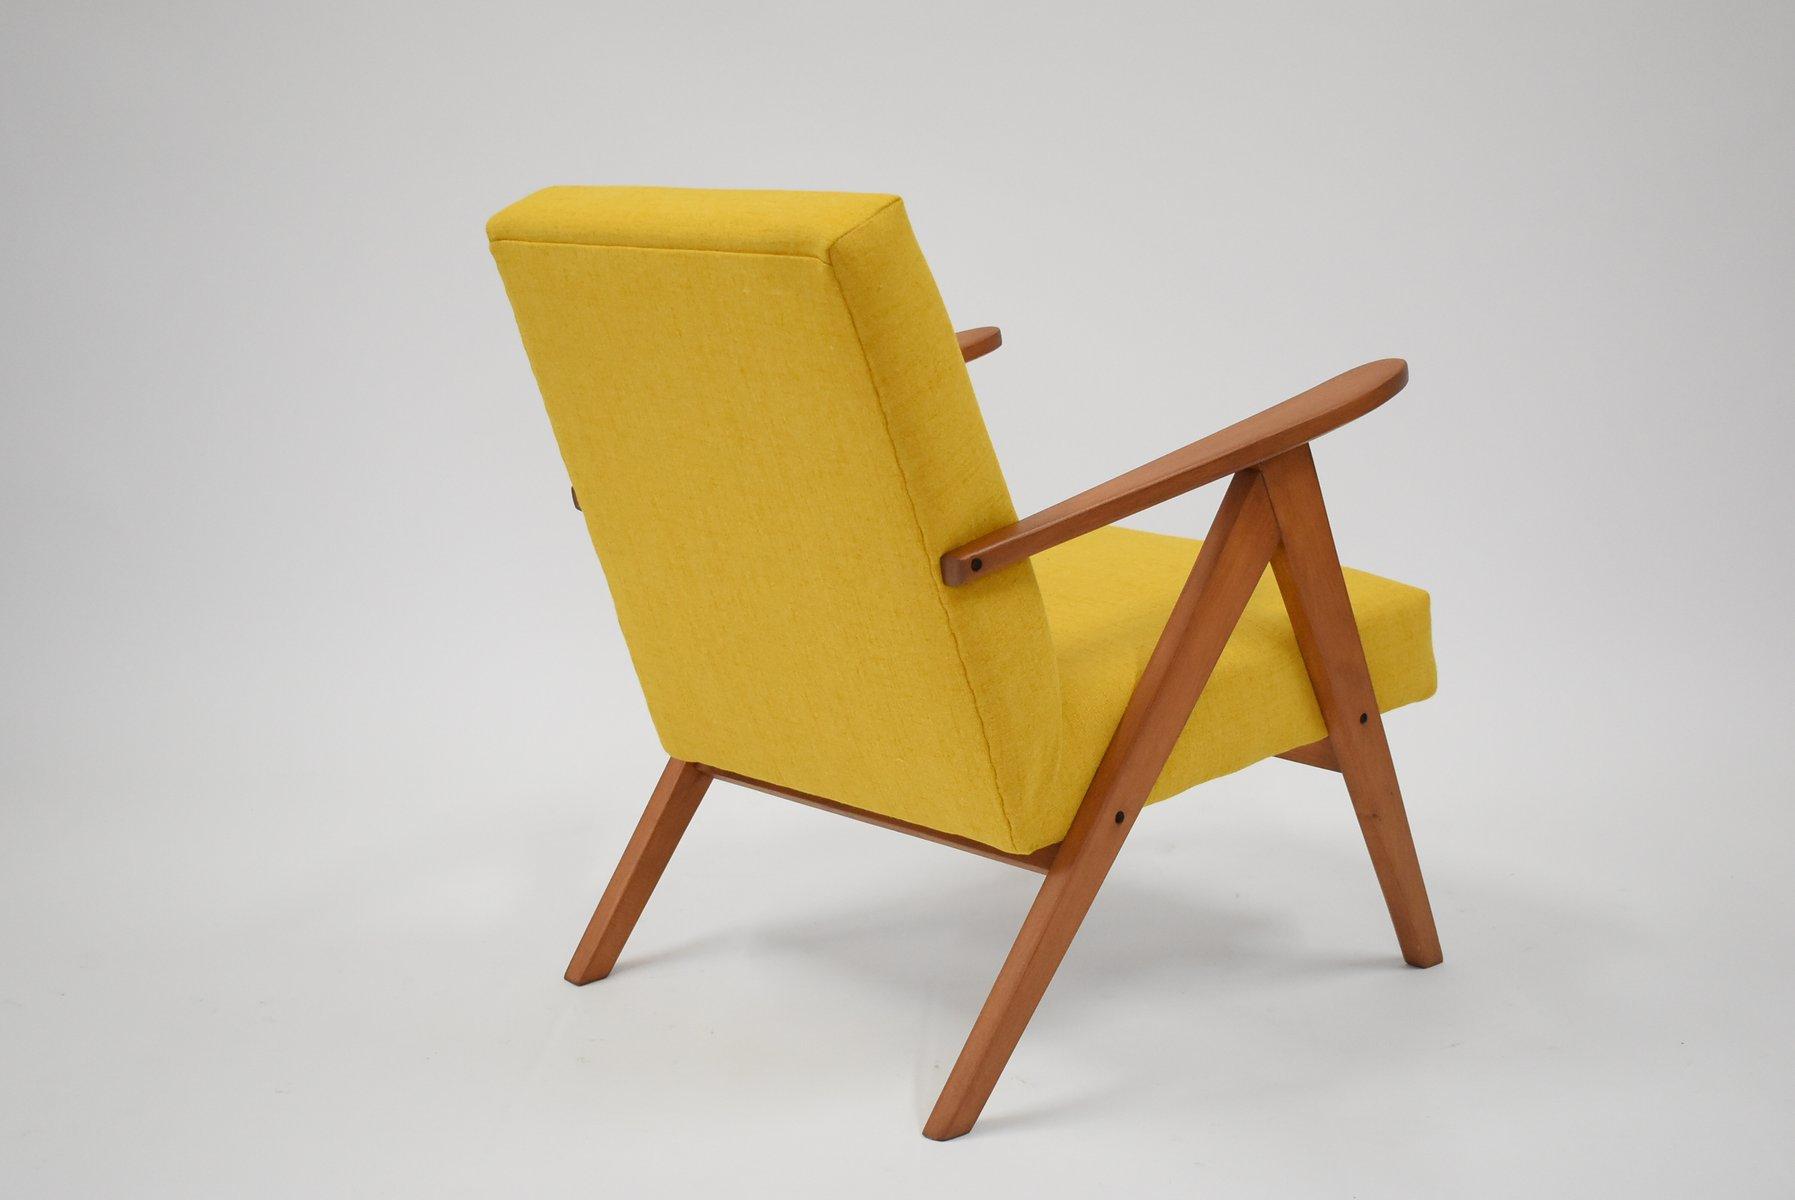 gelber polnischer b 310 var sessel 1960er bei pamono kaufen. Black Bedroom Furniture Sets. Home Design Ideas